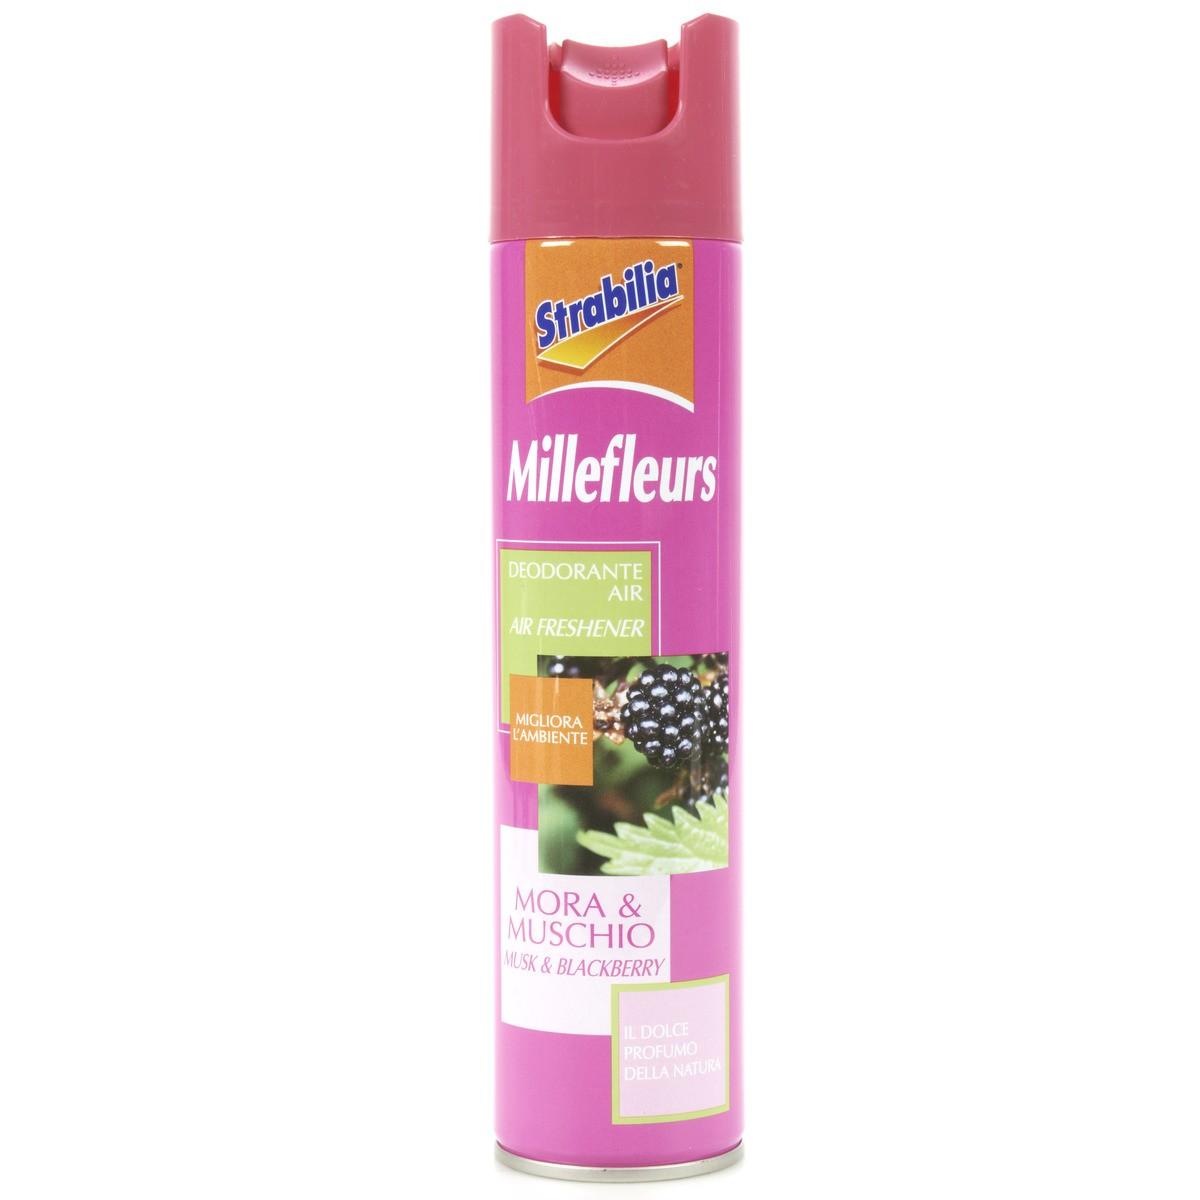 Strabilia Deodorante spray Millefleurs